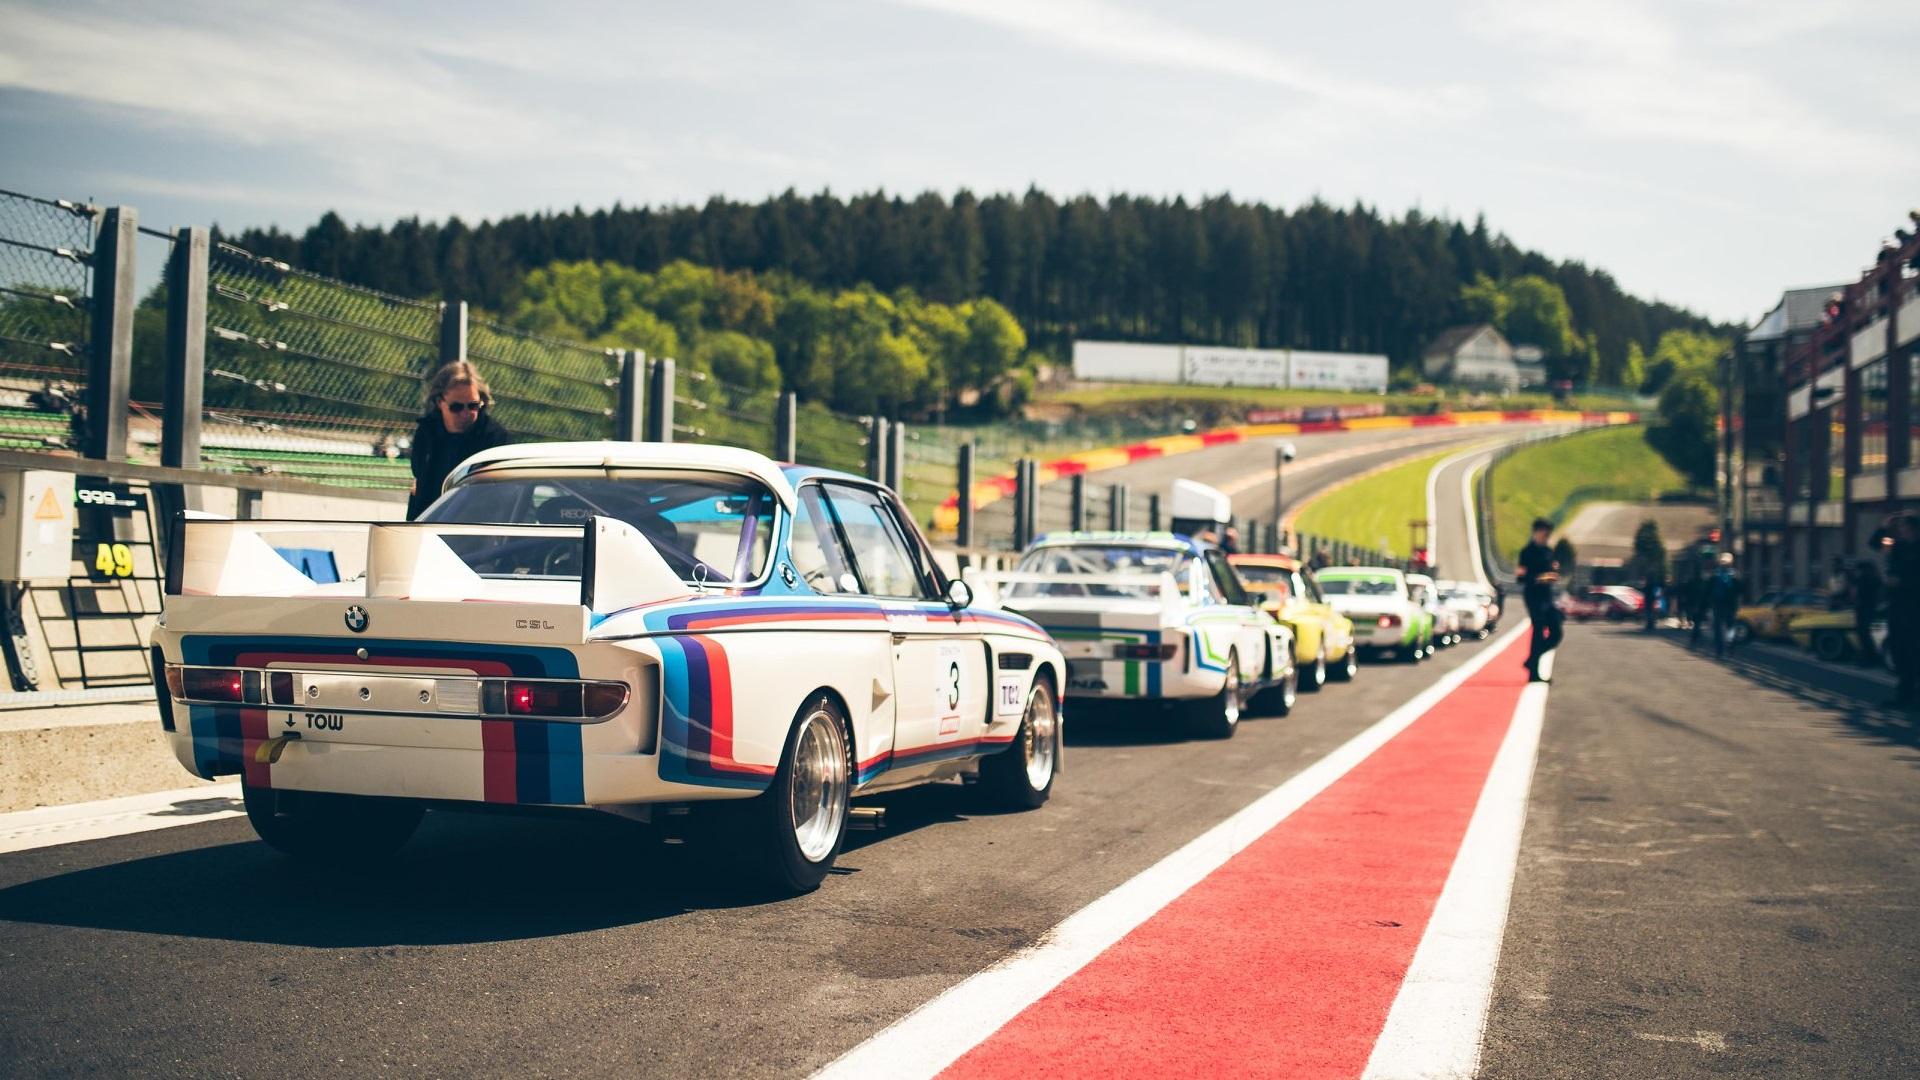 Bmw 3 0 Csl >> Wallpaper Bmw 3 0 Csl Race Cars Spa Francorchamps